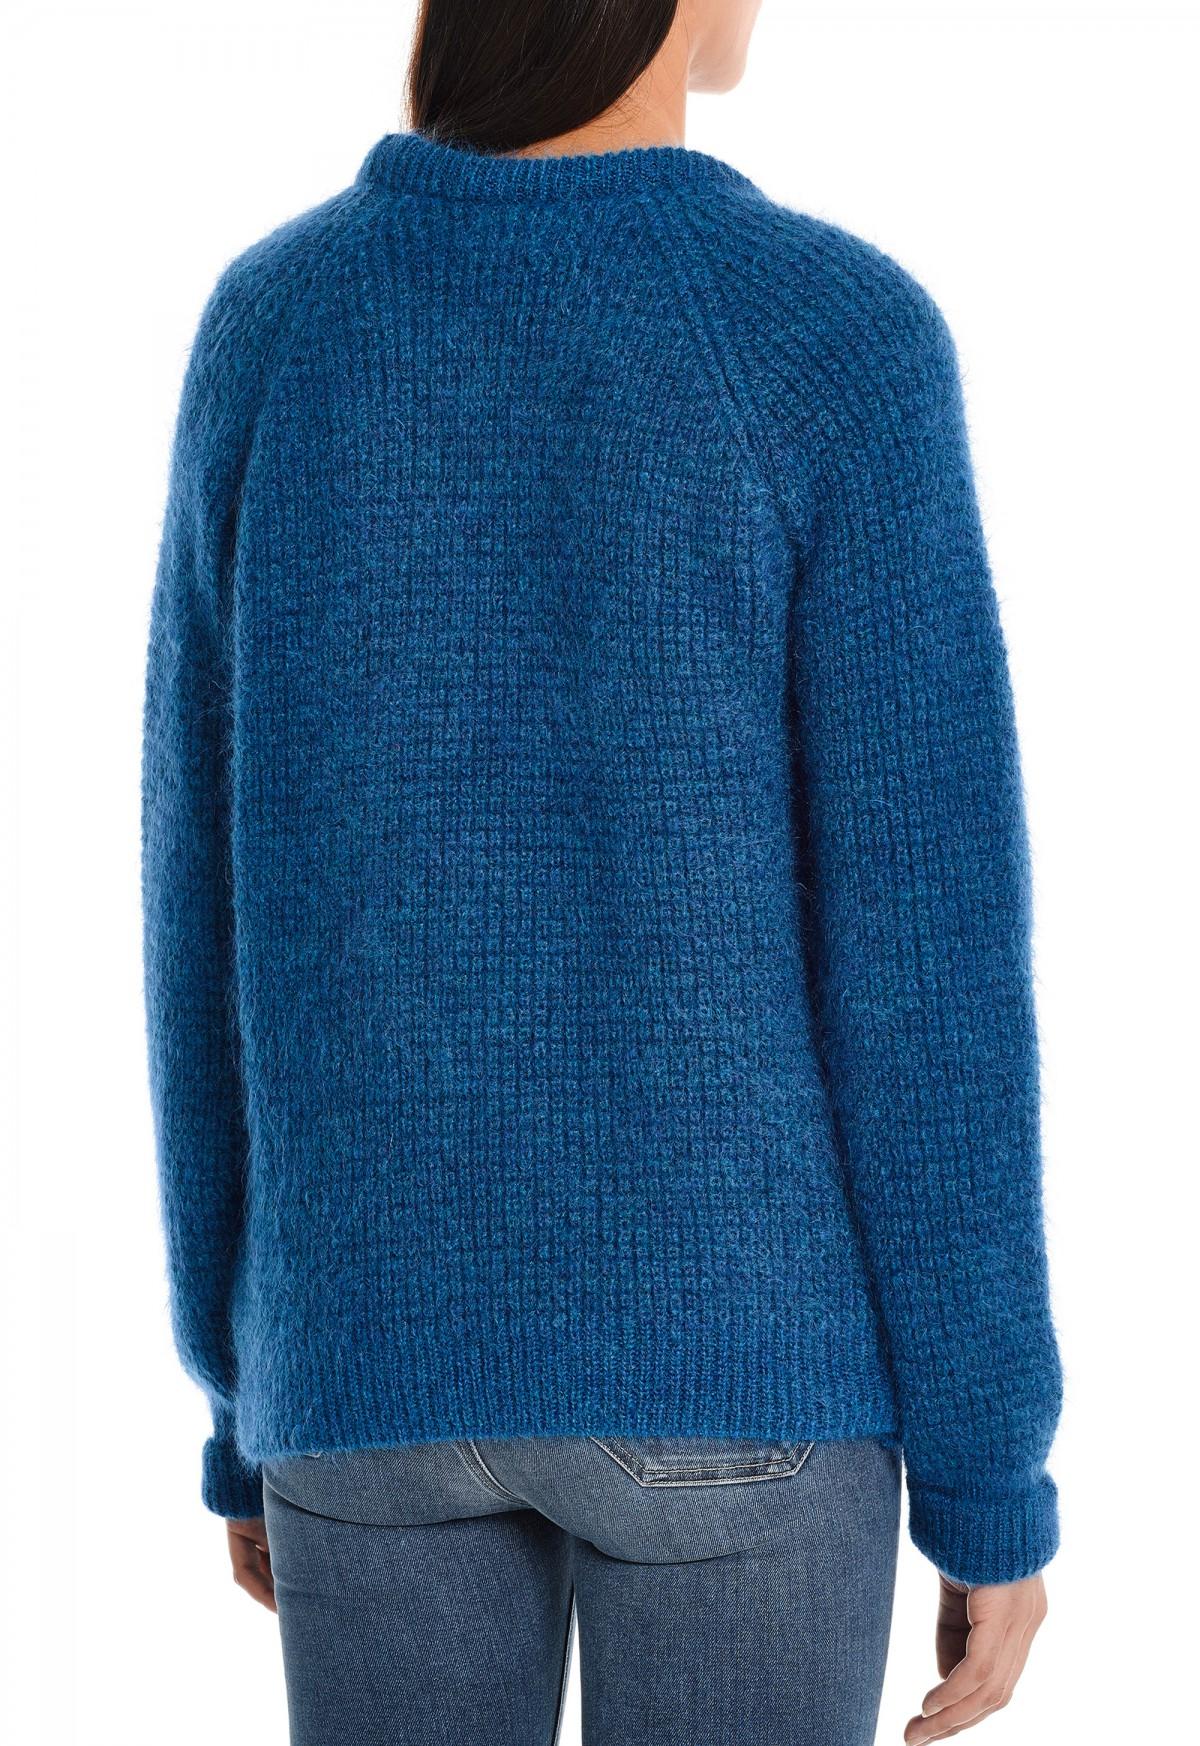 The WAFFLE Sweater